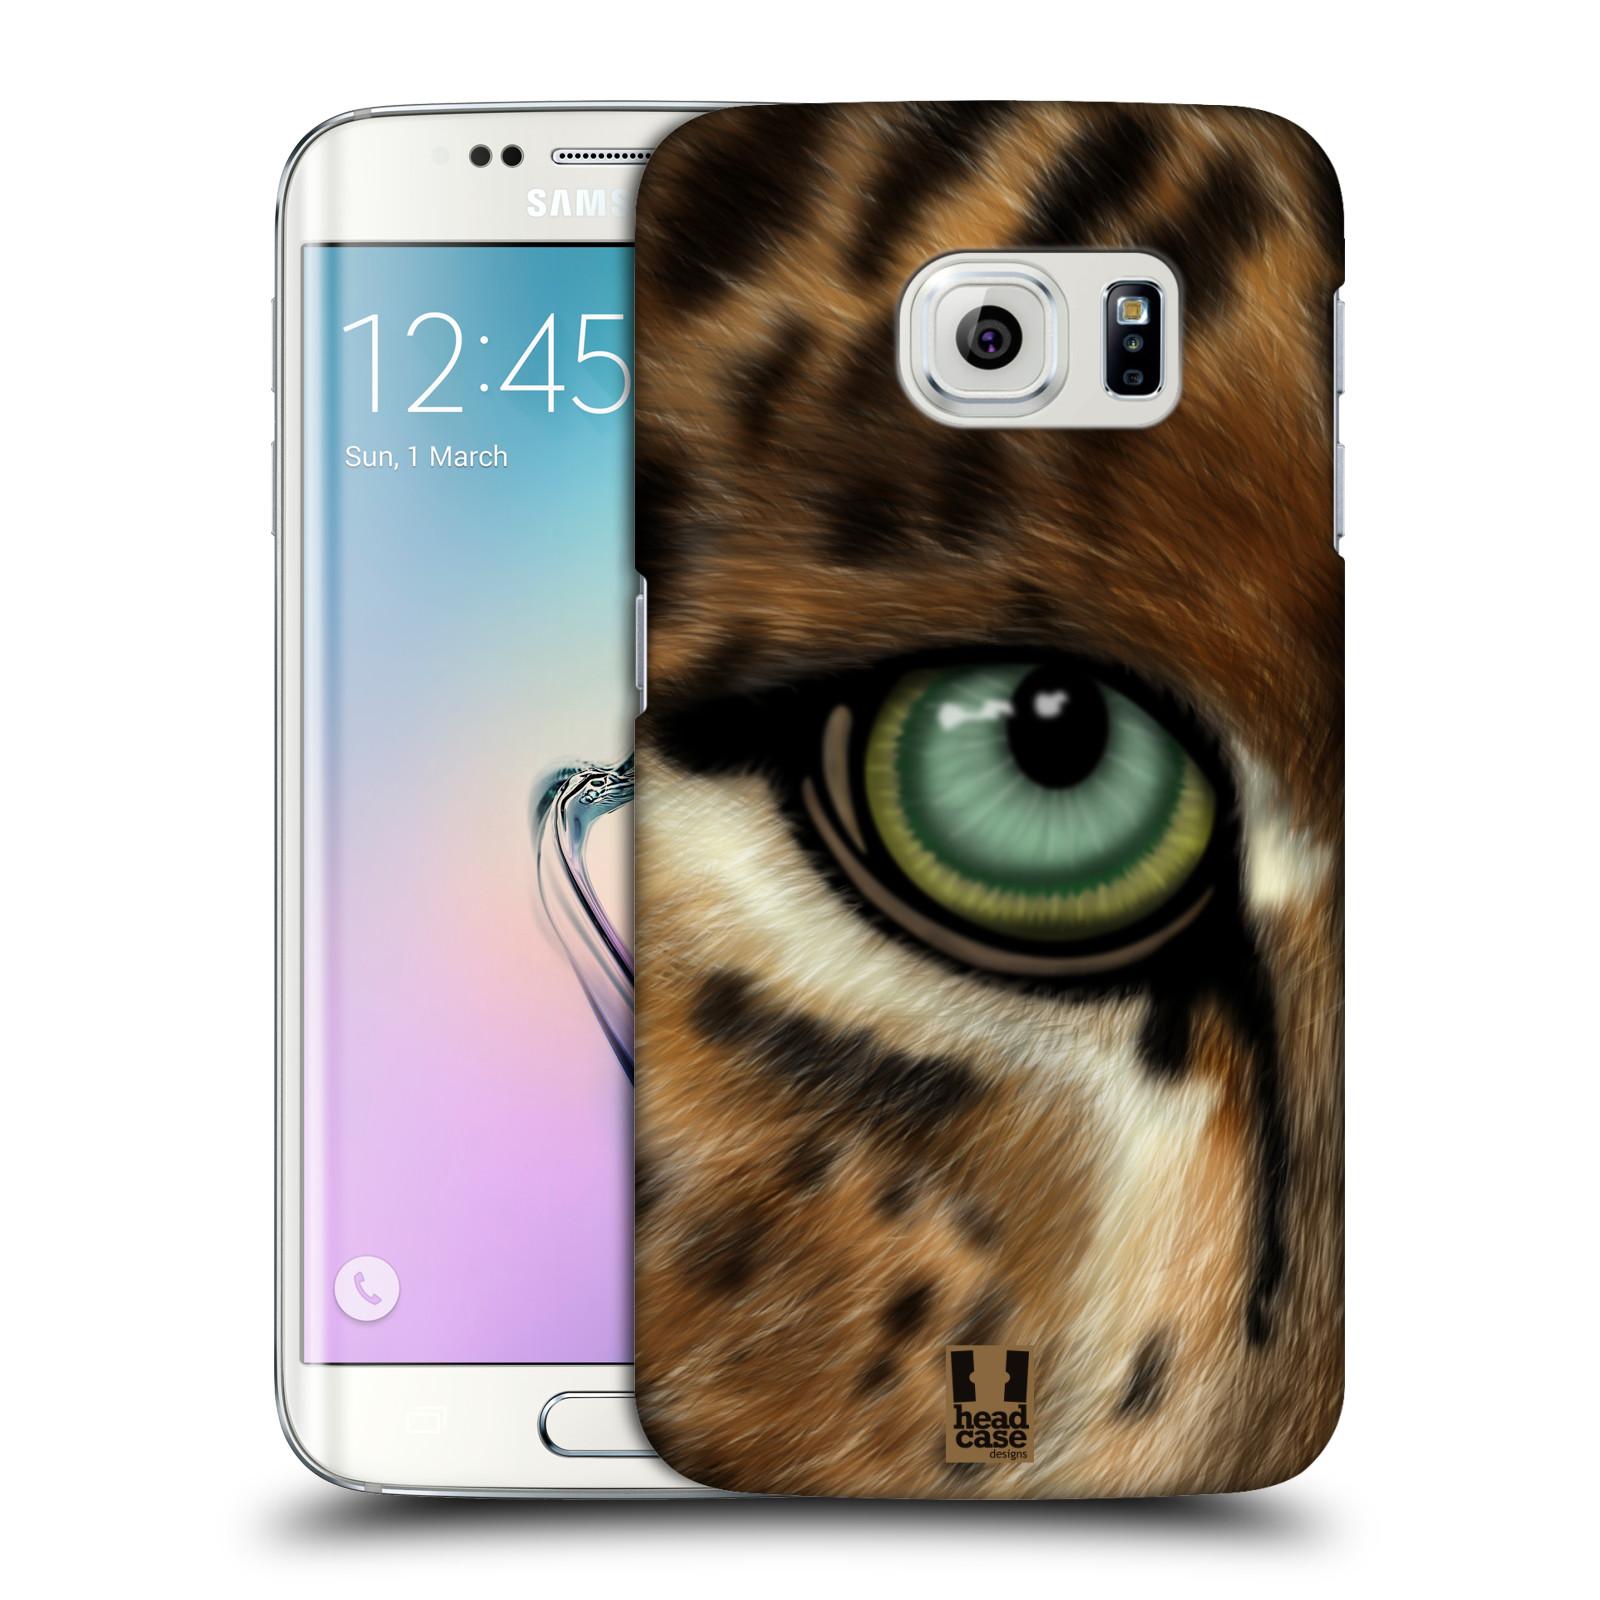 HEAD CASE plastový obal na mobil SAMSUNG Galaxy S6 EDGE (G9250, G925, G925F) vzor pohled zvířete oko leopard